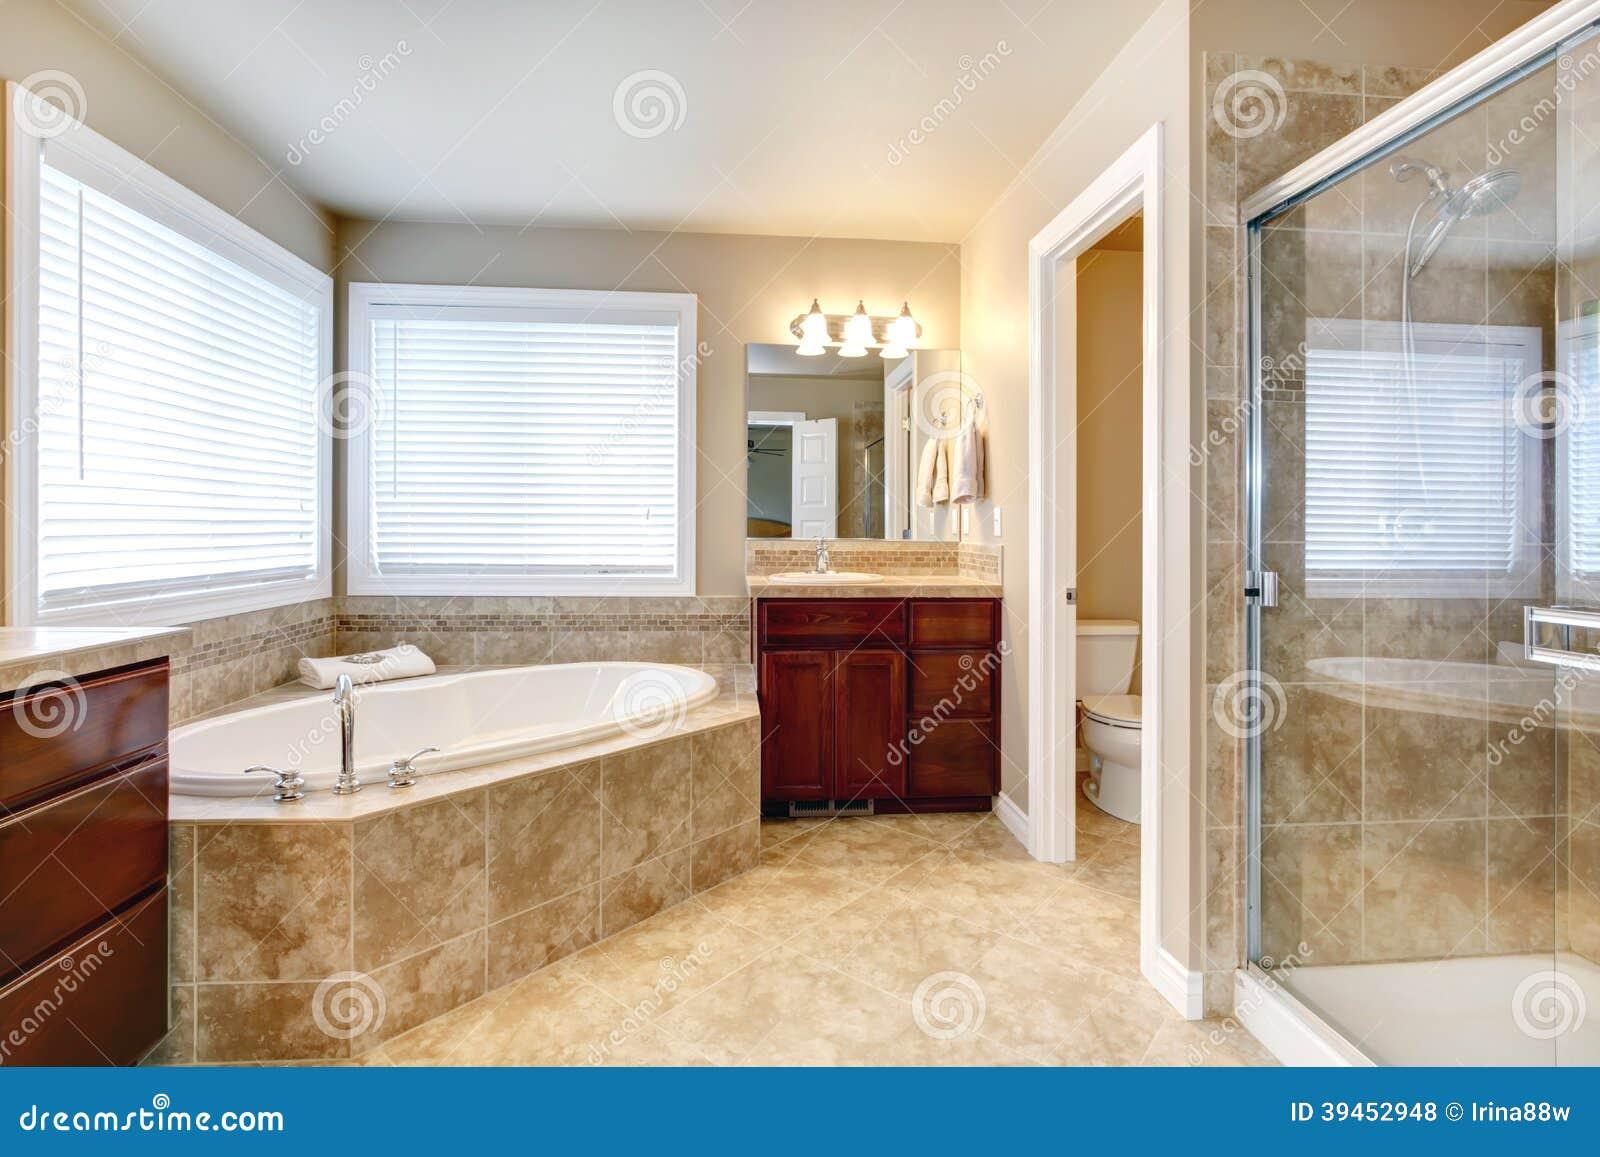 Baños Con Tina Modernos ~ Dikidu.com